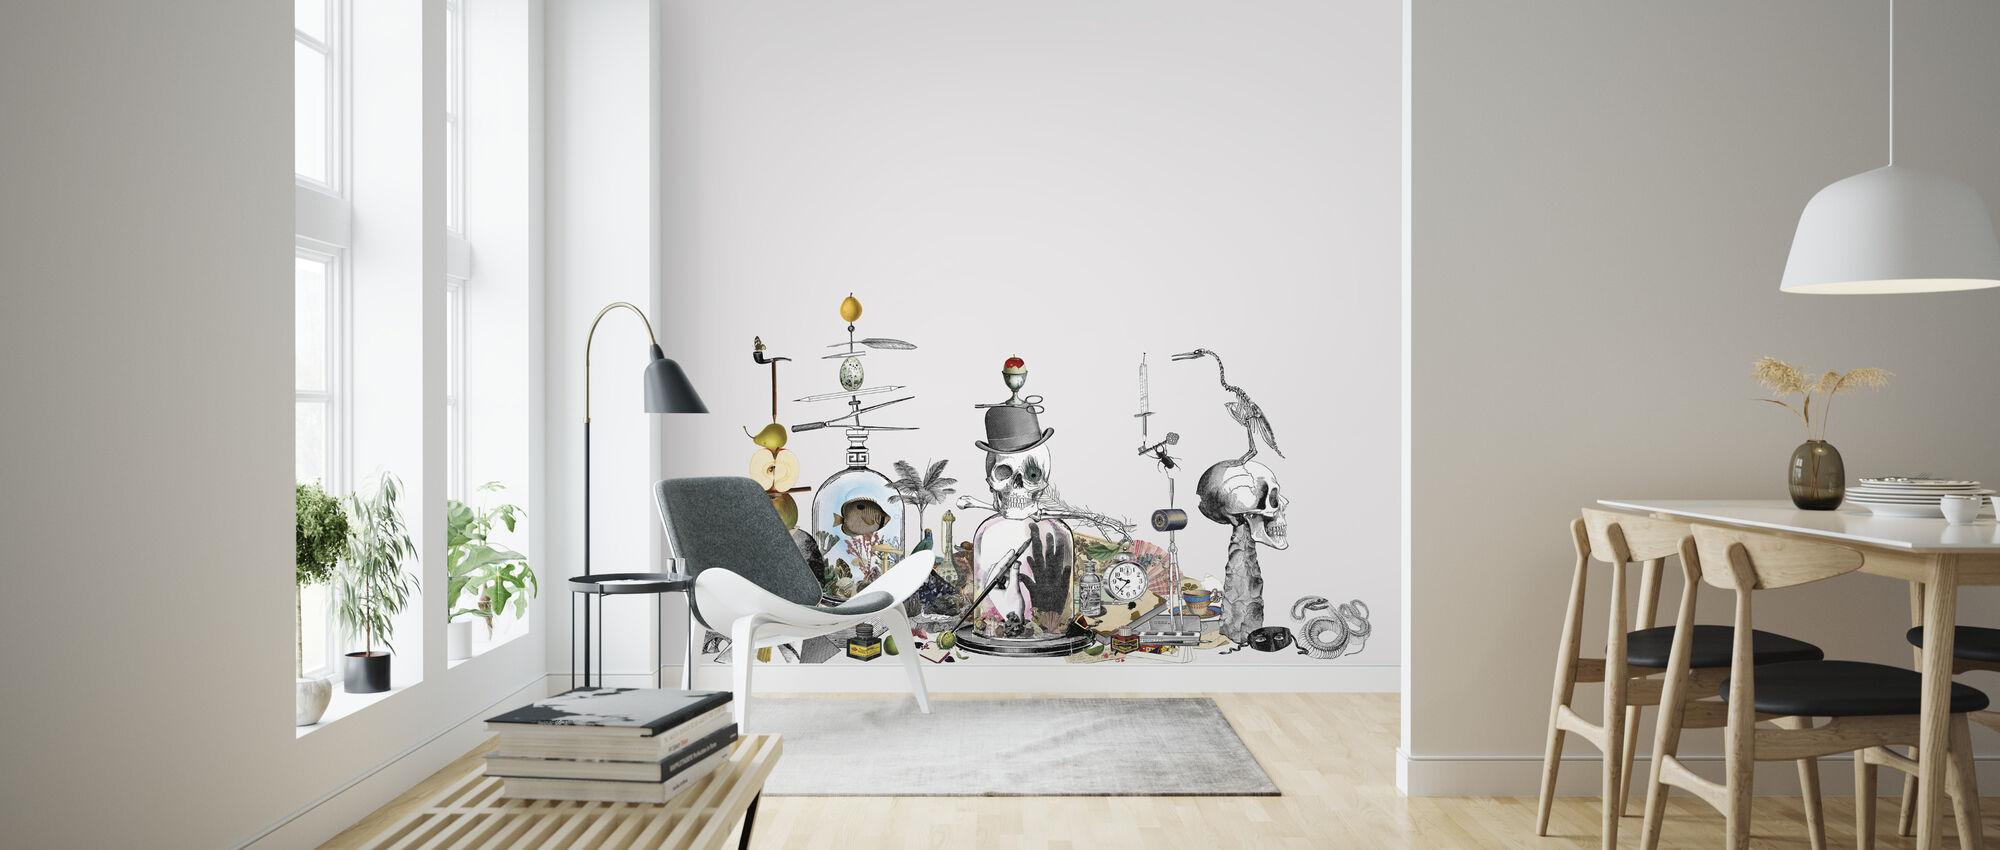 Junkyard - Gray - Wallpaper - Living Room